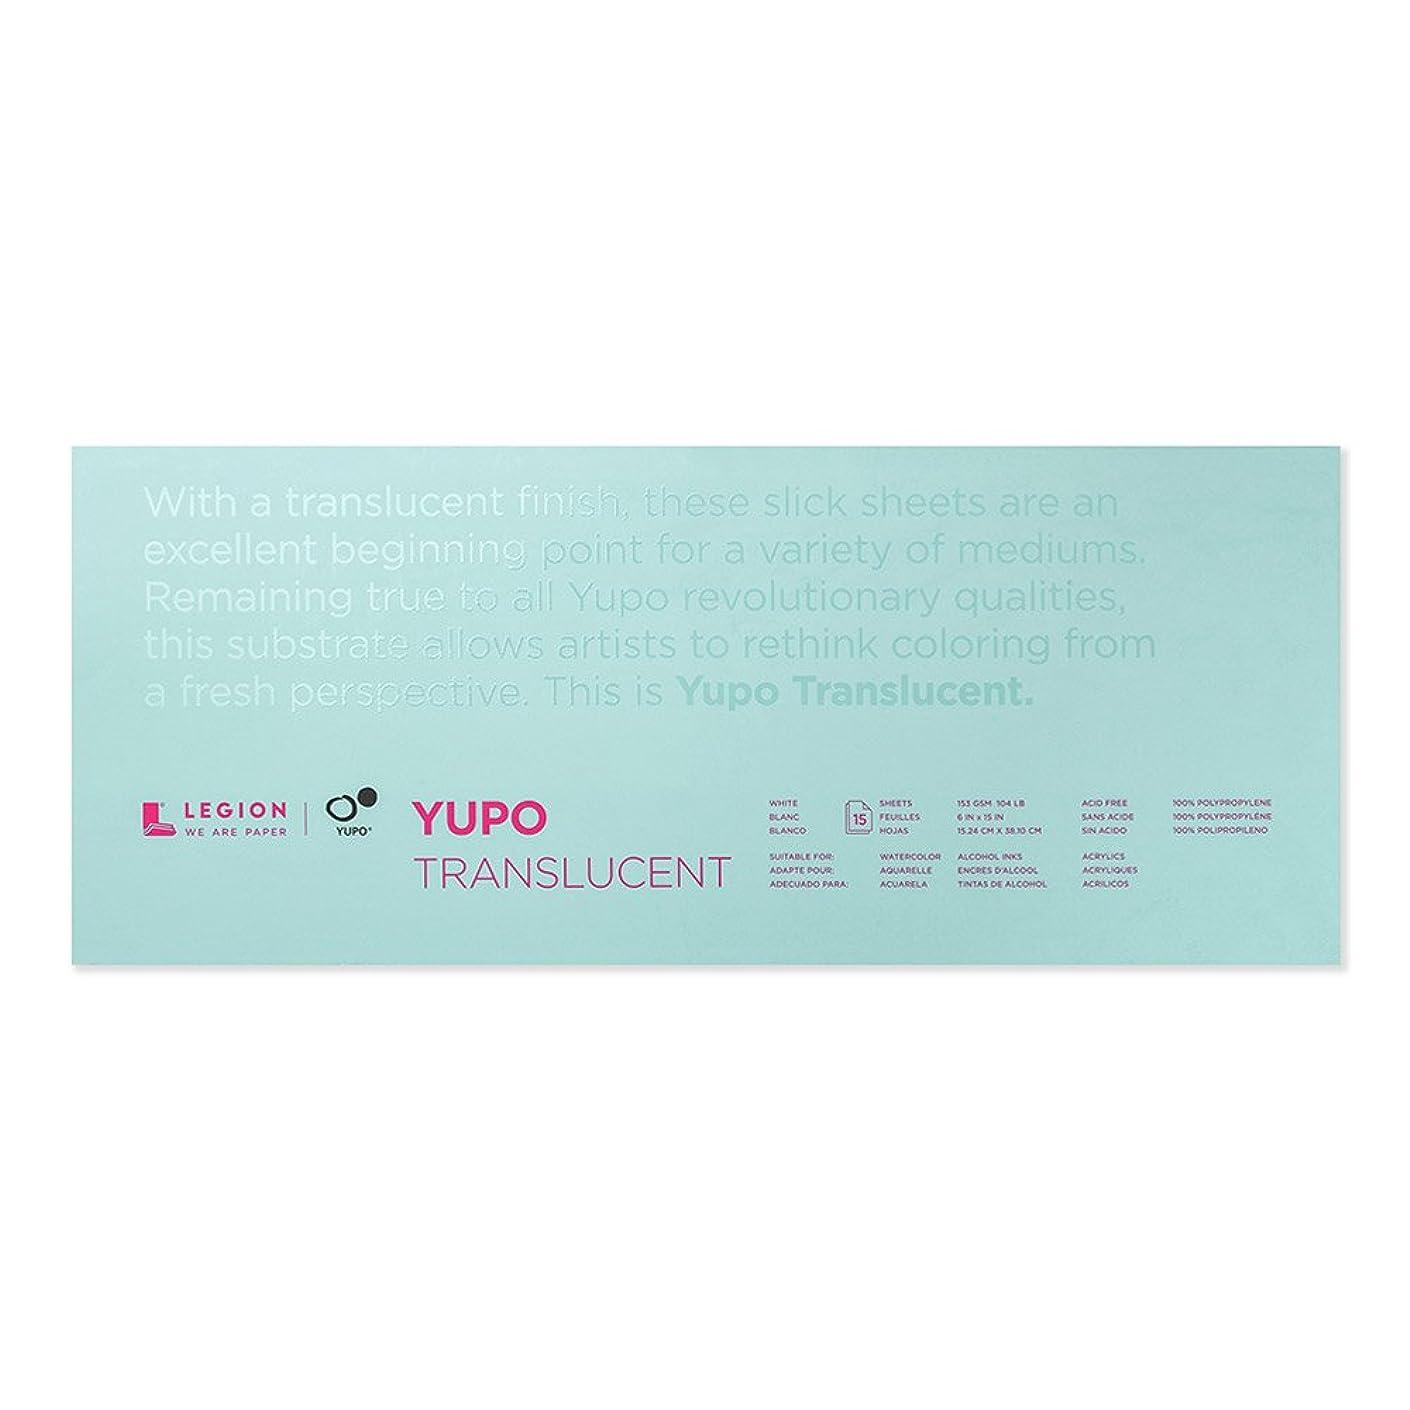 Legion Yupo Translucent Polypropylene Pad, 6 X 15 inches, 104lb, 15 Sheets (L21-YPT153WH615)